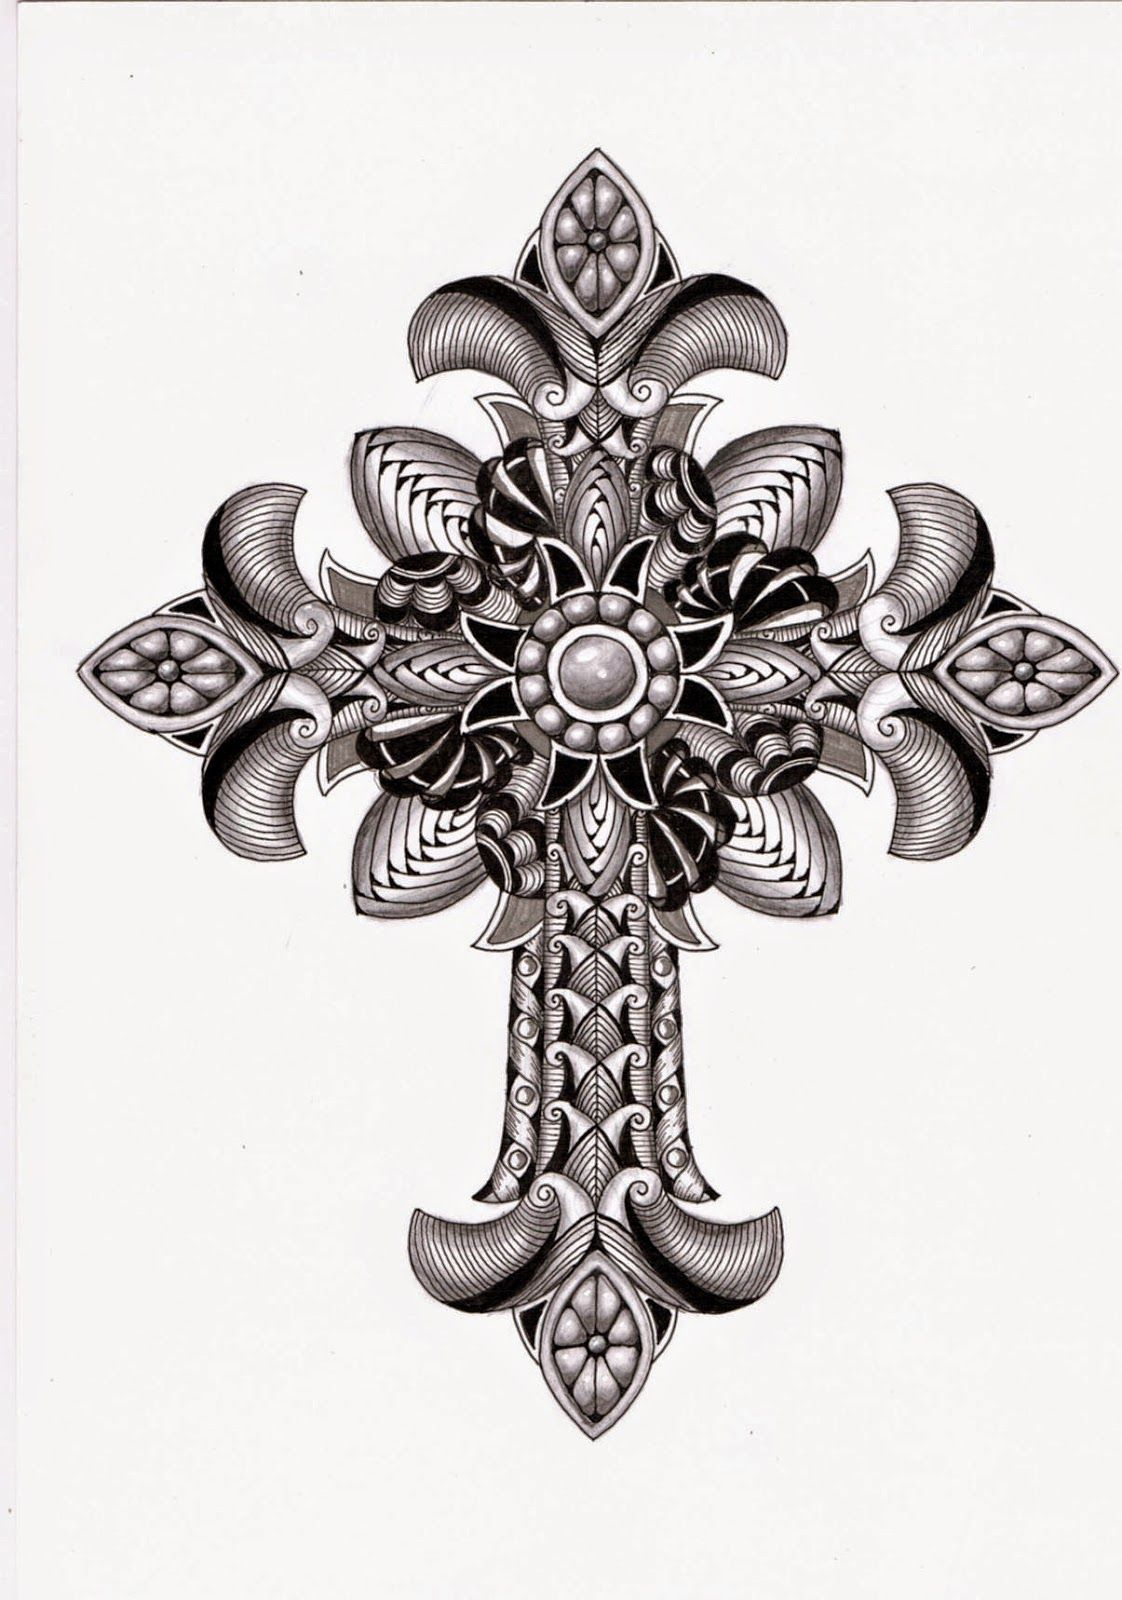 lily 39 s tangles ornate cross template ben kwok zentangles doodle art etc pinterest. Black Bedroom Furniture Sets. Home Design Ideas